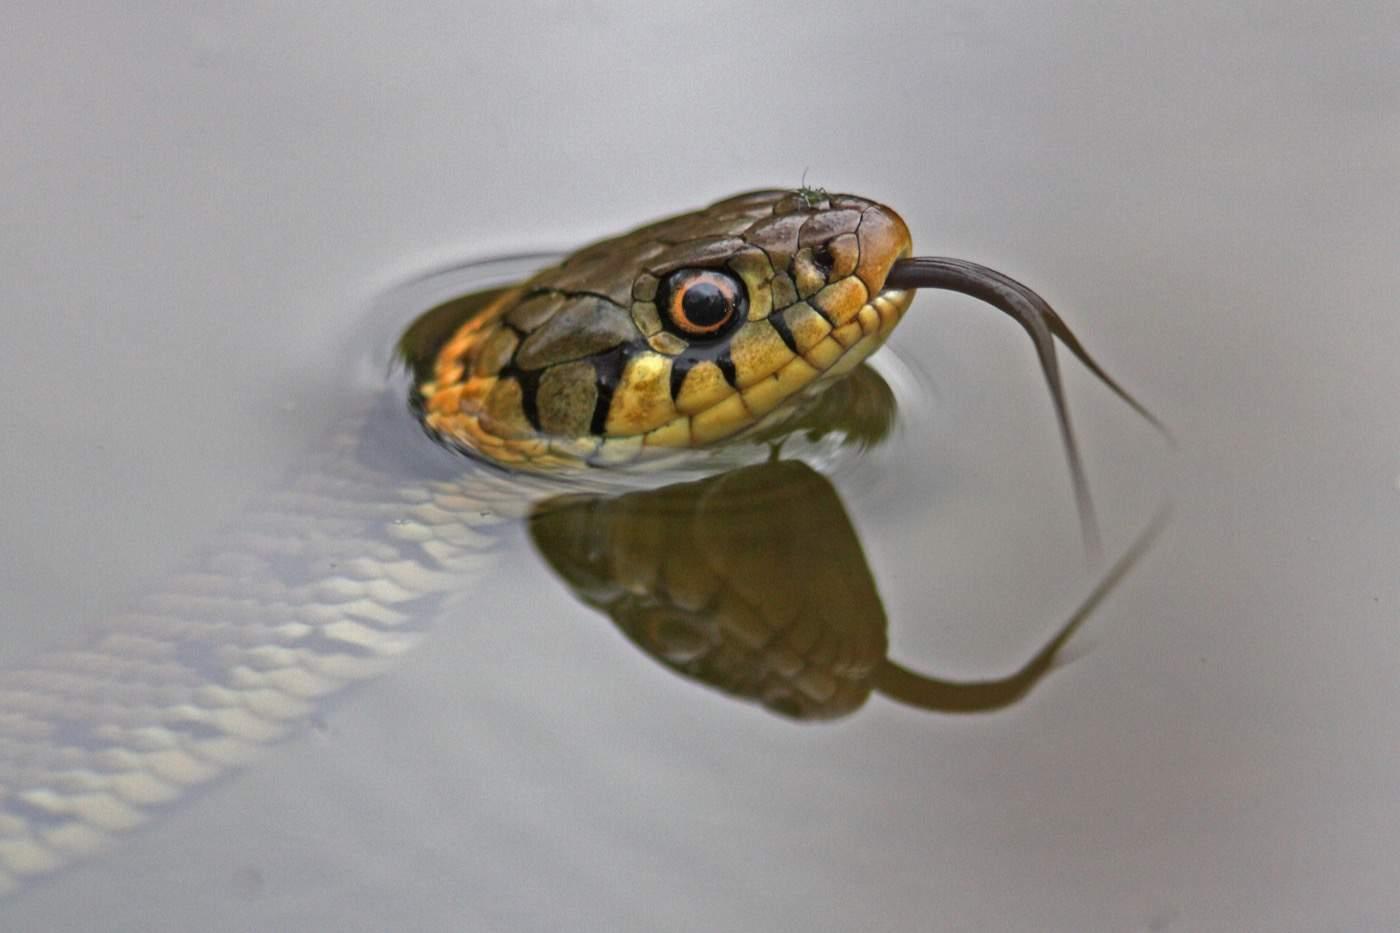 Grass-snake_OakhamKR1